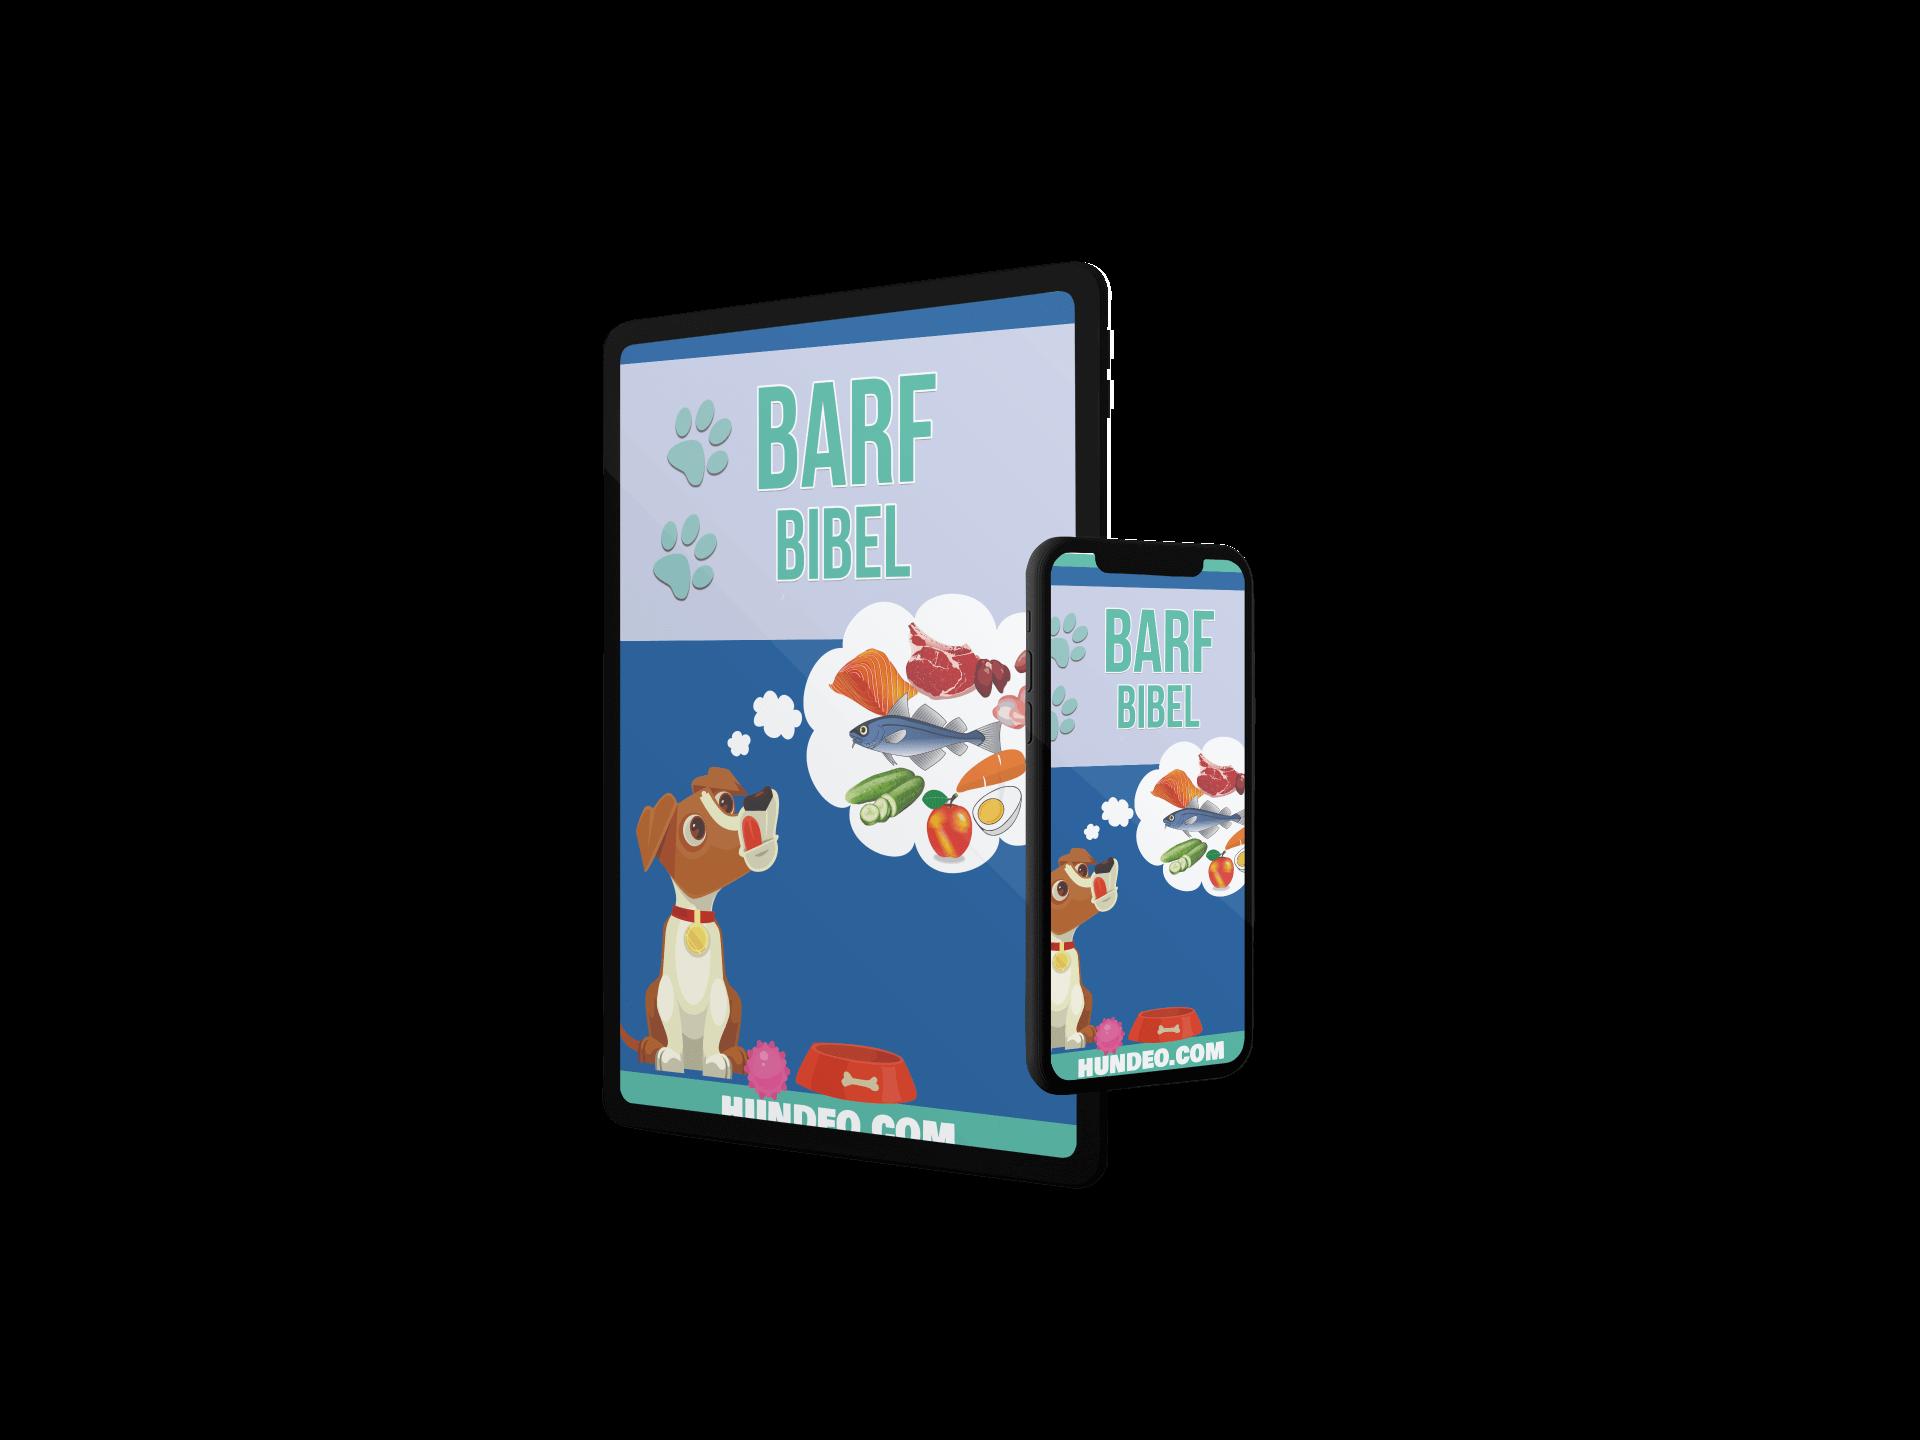 Barf Bibel Partnerprogramm 11